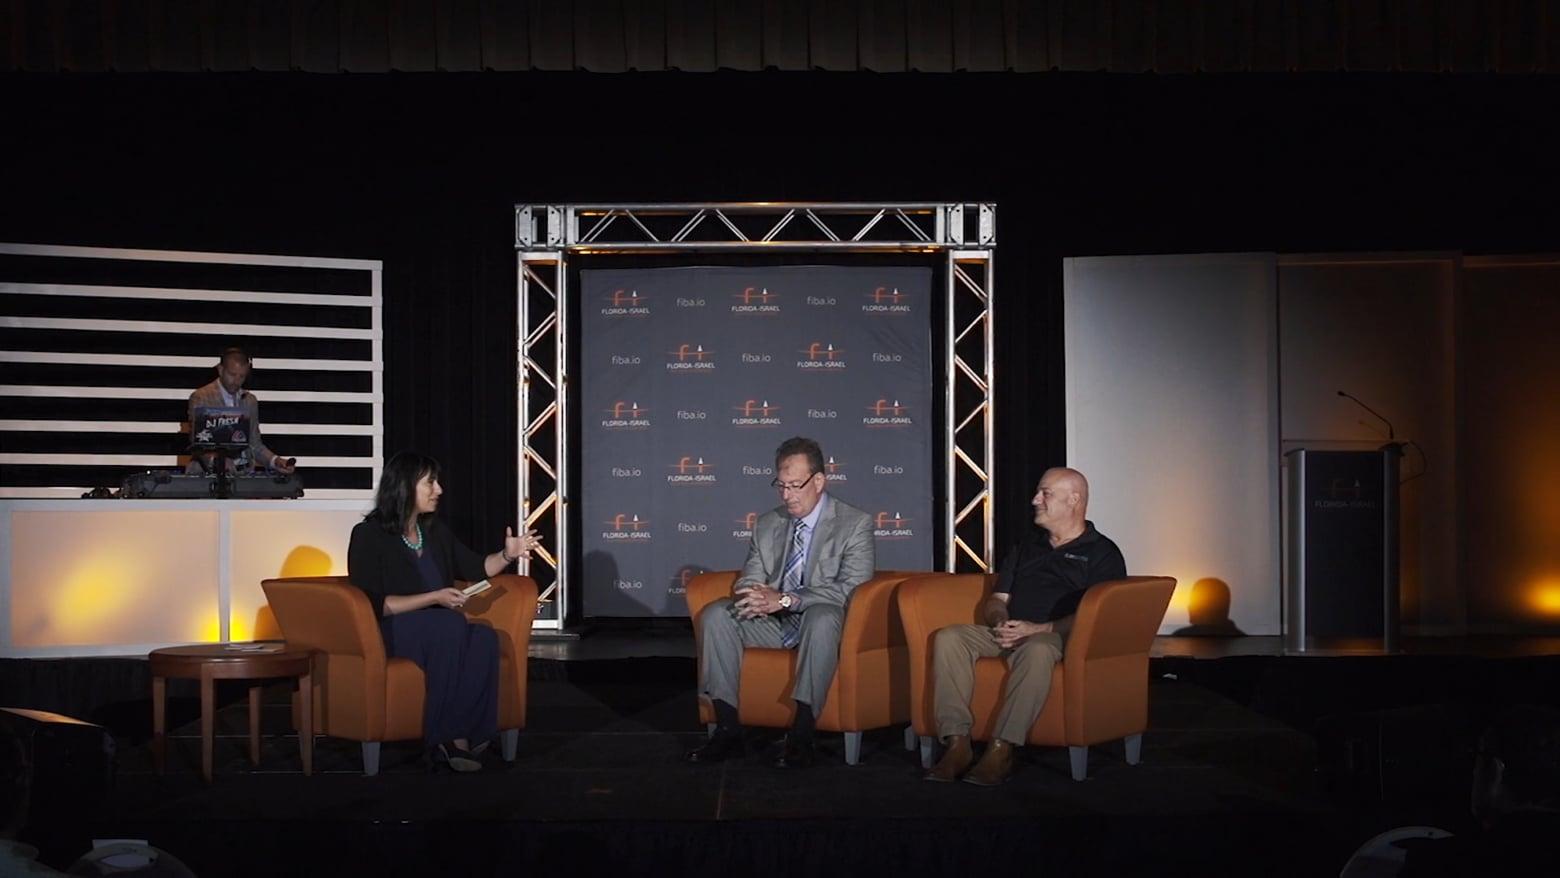 FIBA-Innovation Fusion 2018-Carmi Peleg/GlobeKeeper & Captain David Goodman/TPD